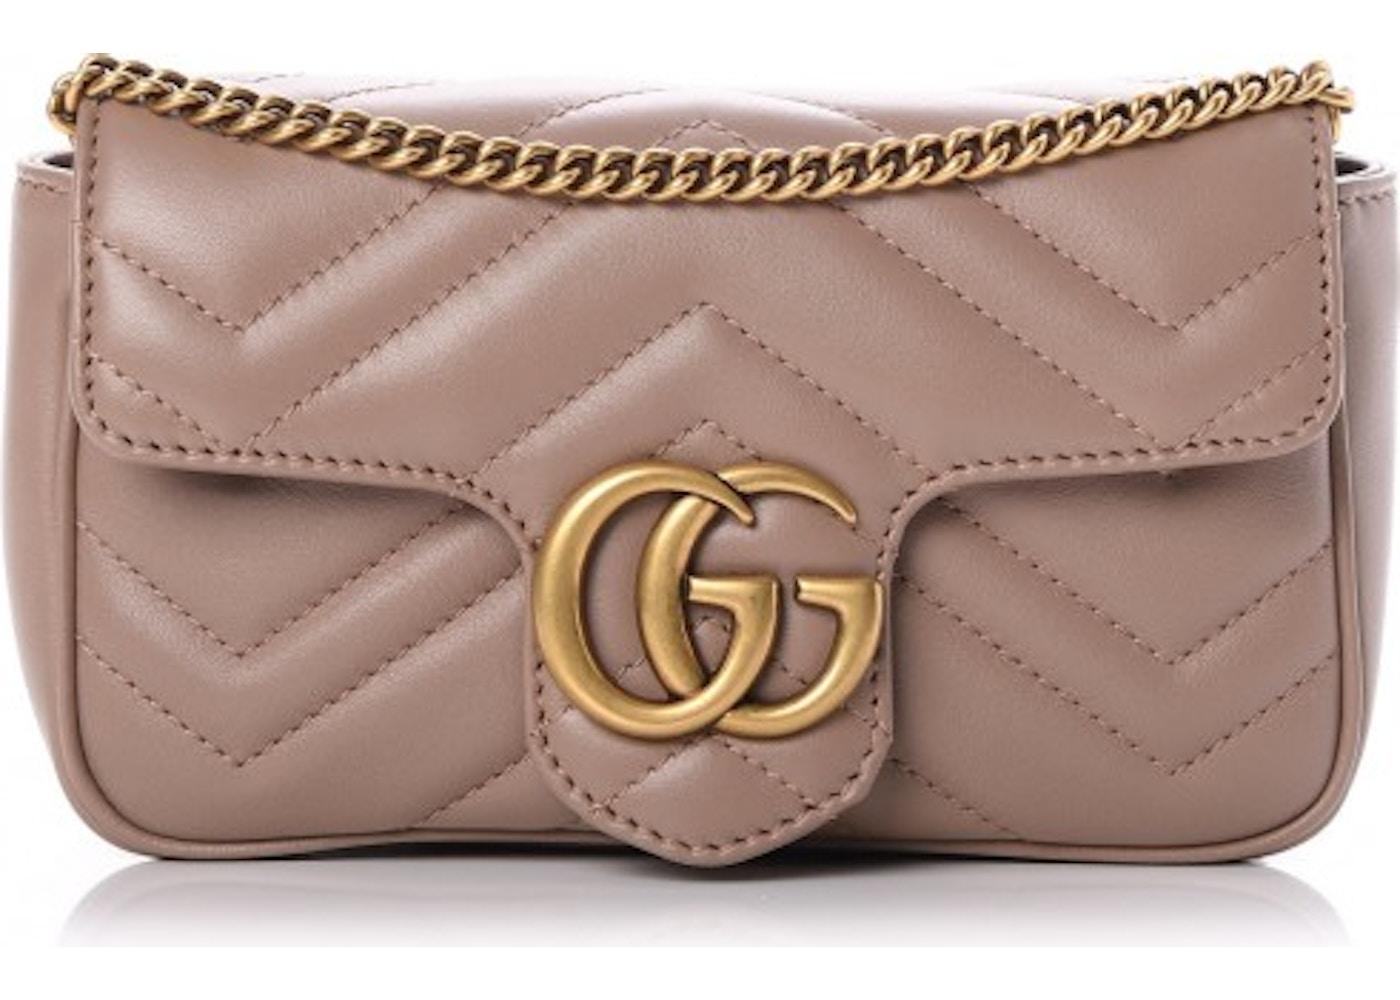 d050d858b046 Gucci Marmont Flap Matelasse GG Super Mini Dusty Pink